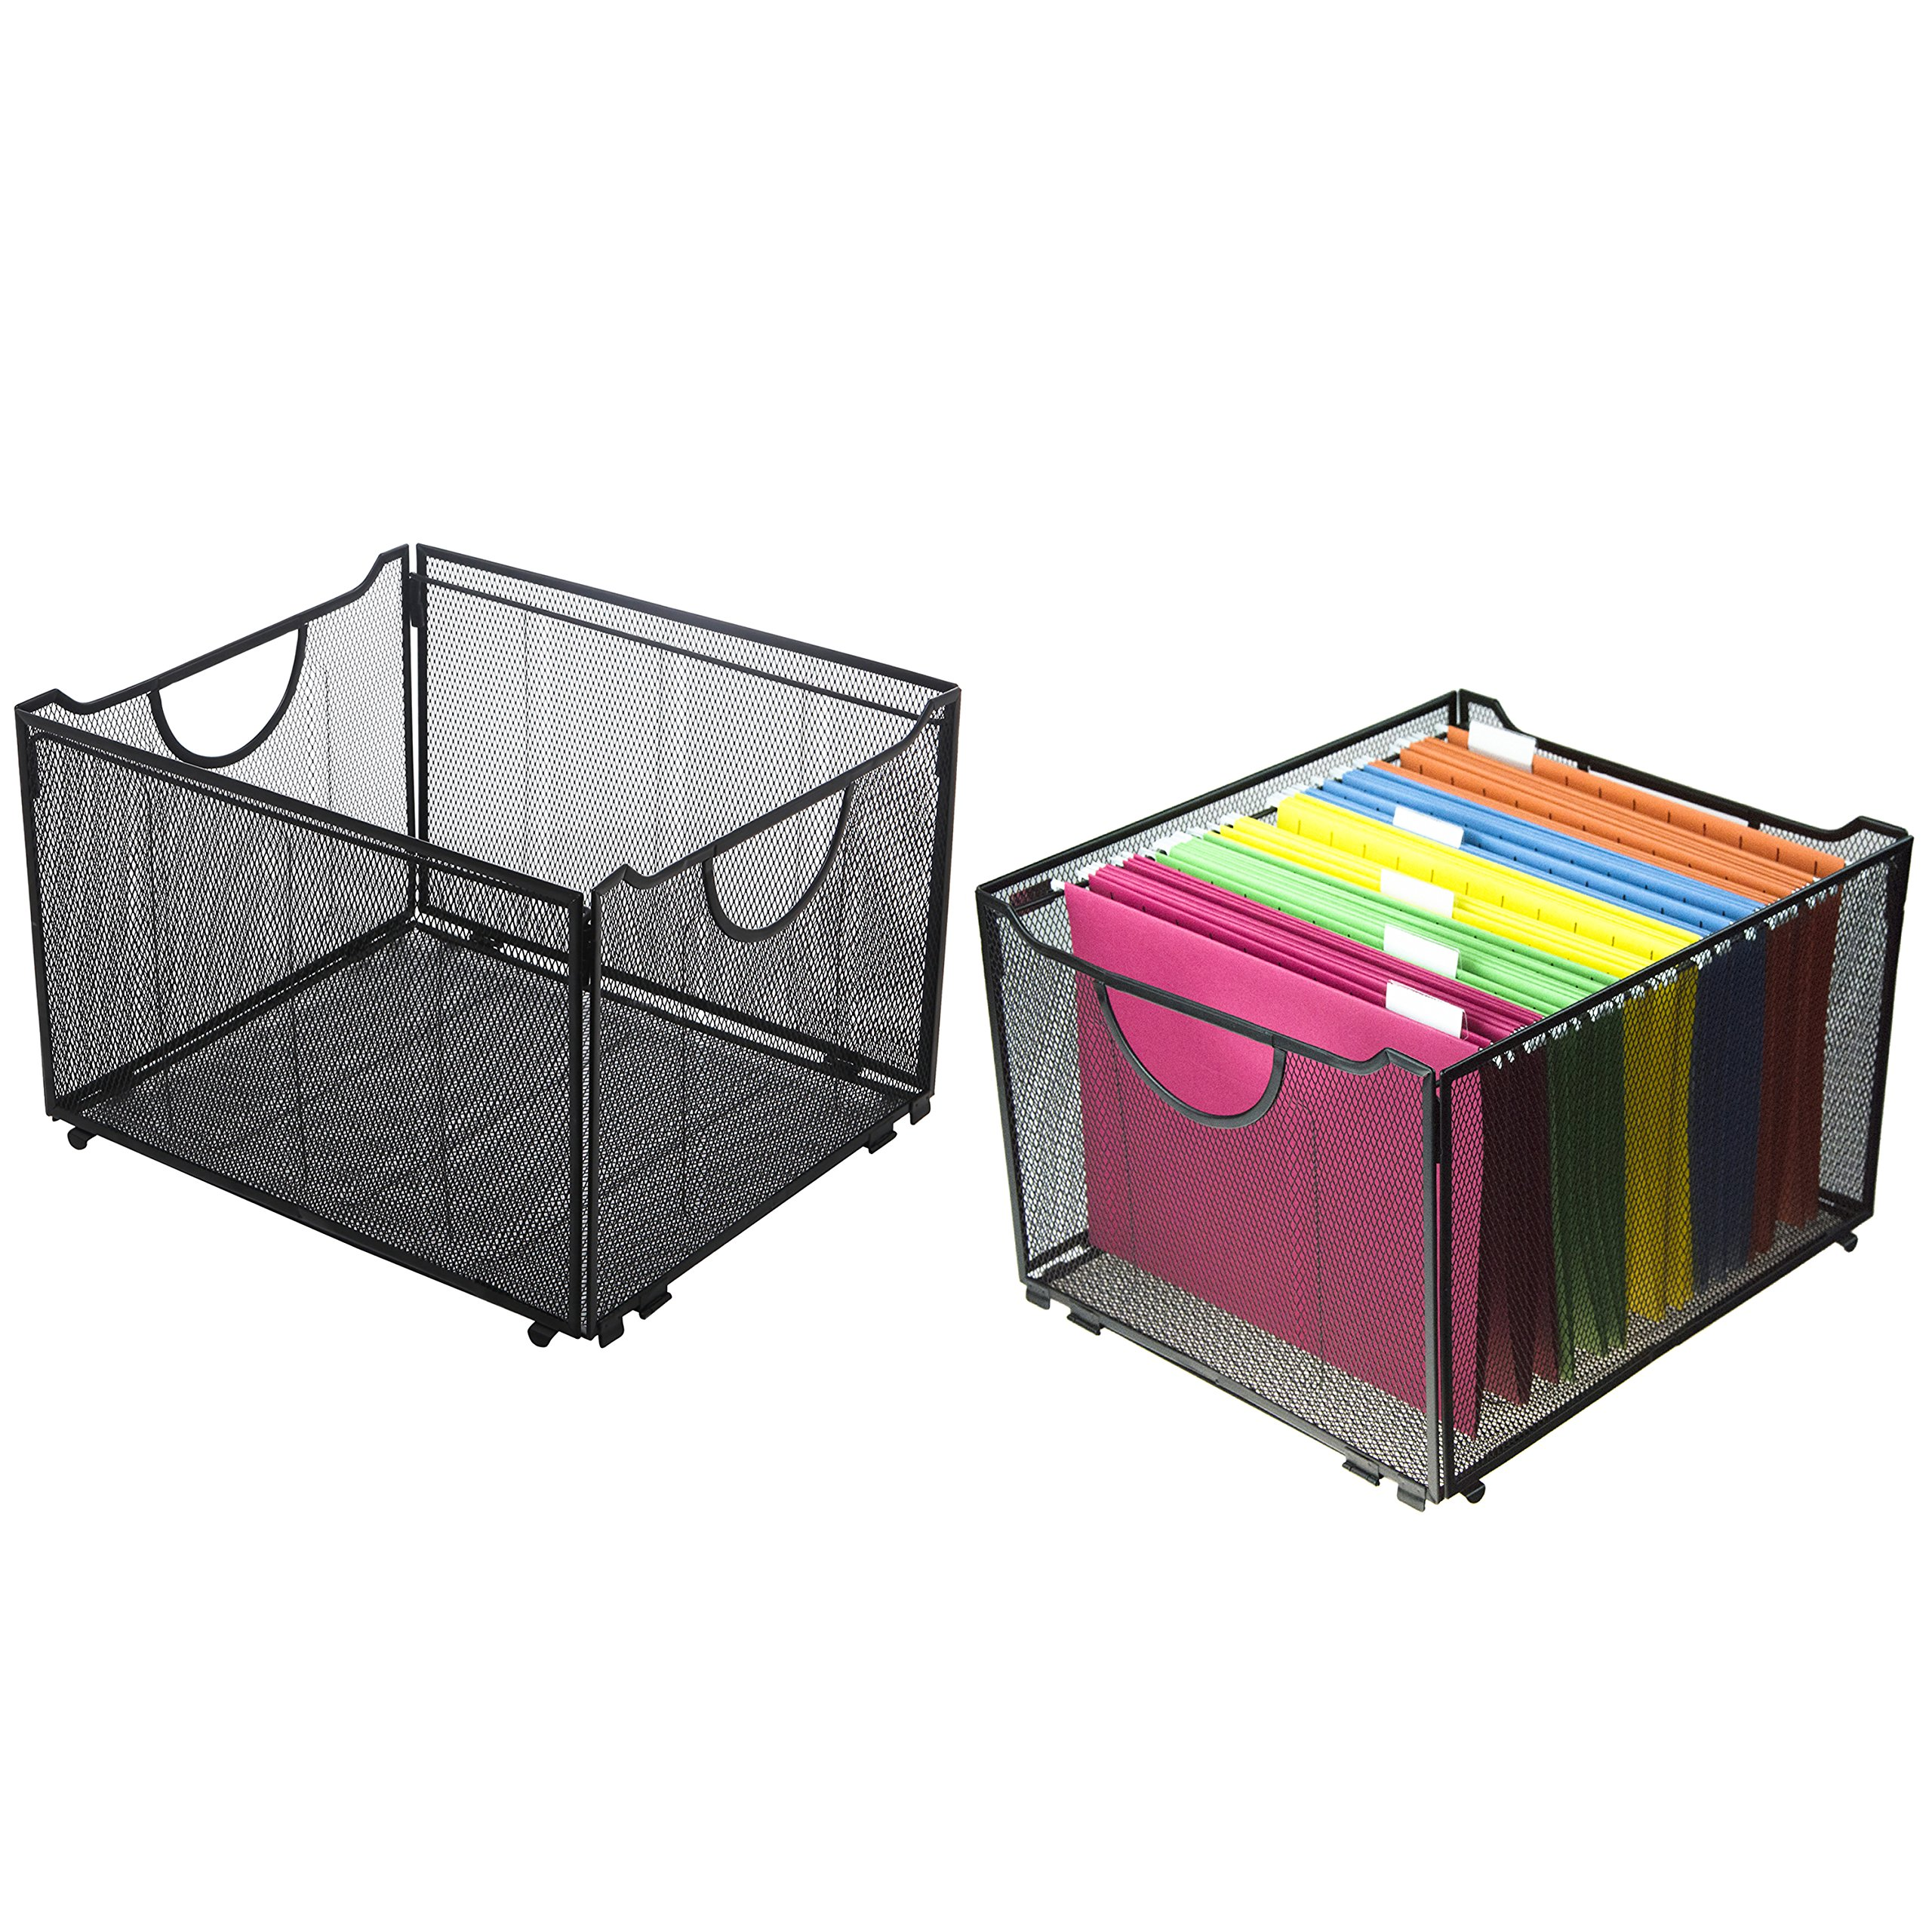 Set of 2 Modern Black Metal Mesh Foldable Office File Folder Organizer Rack Storage Crate by MyGift